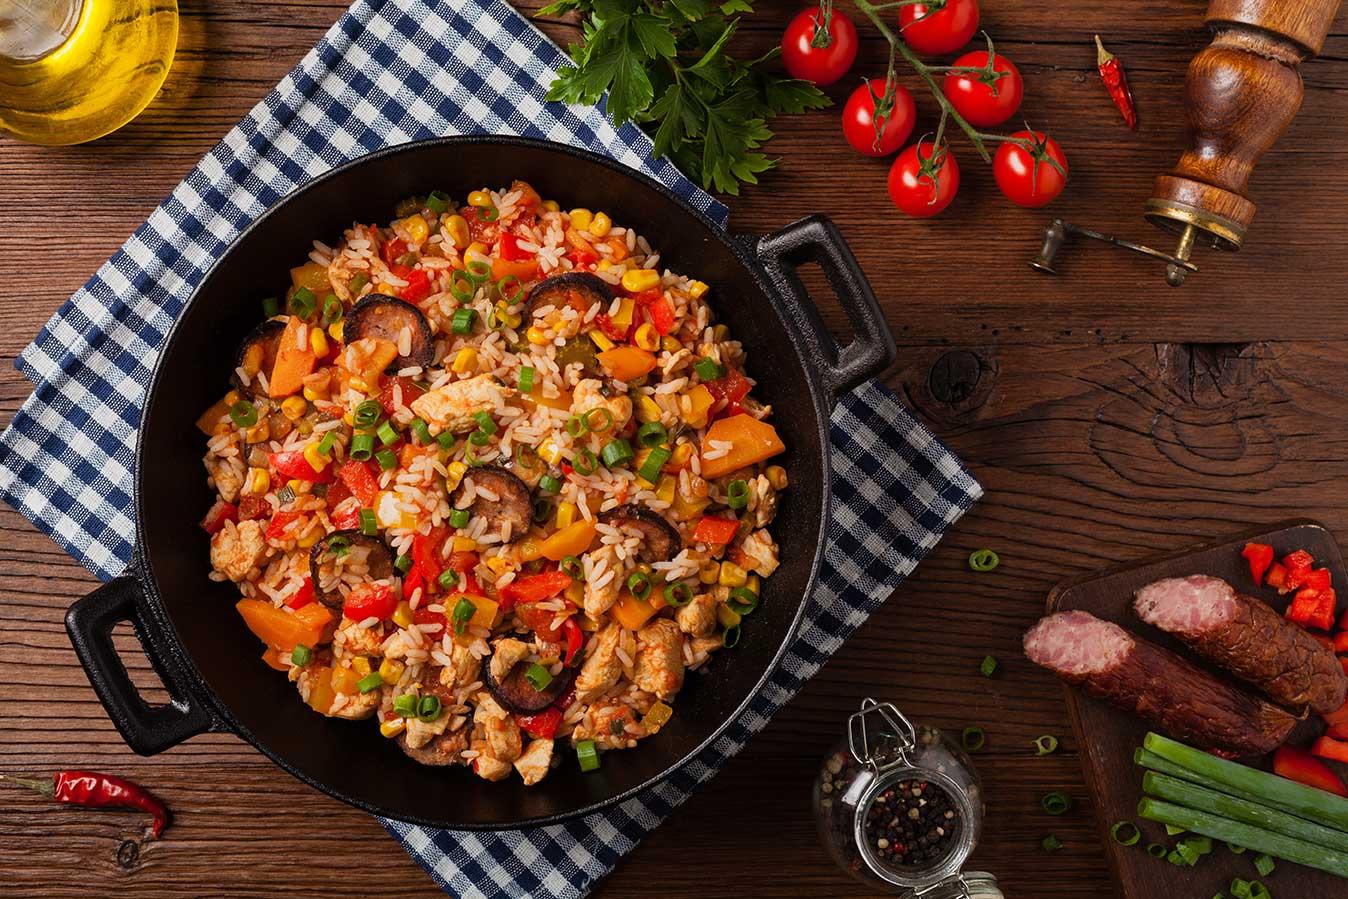 Quick and Easy Chicken and Shrimp Jambalaya via @mermaidsandmojitos